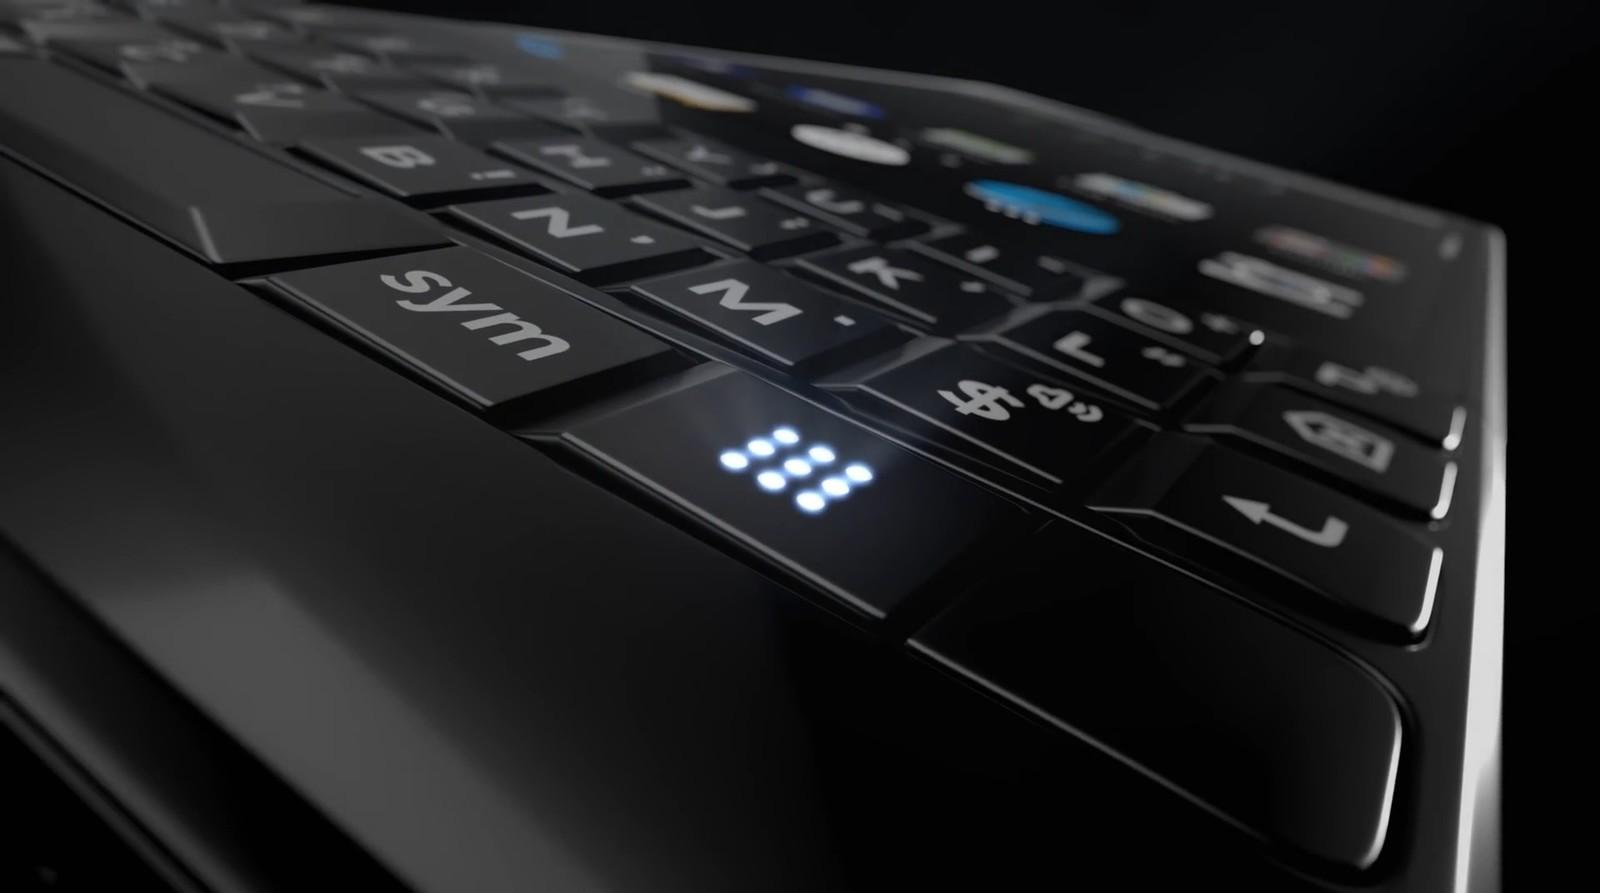 key2-button-tease.jpg